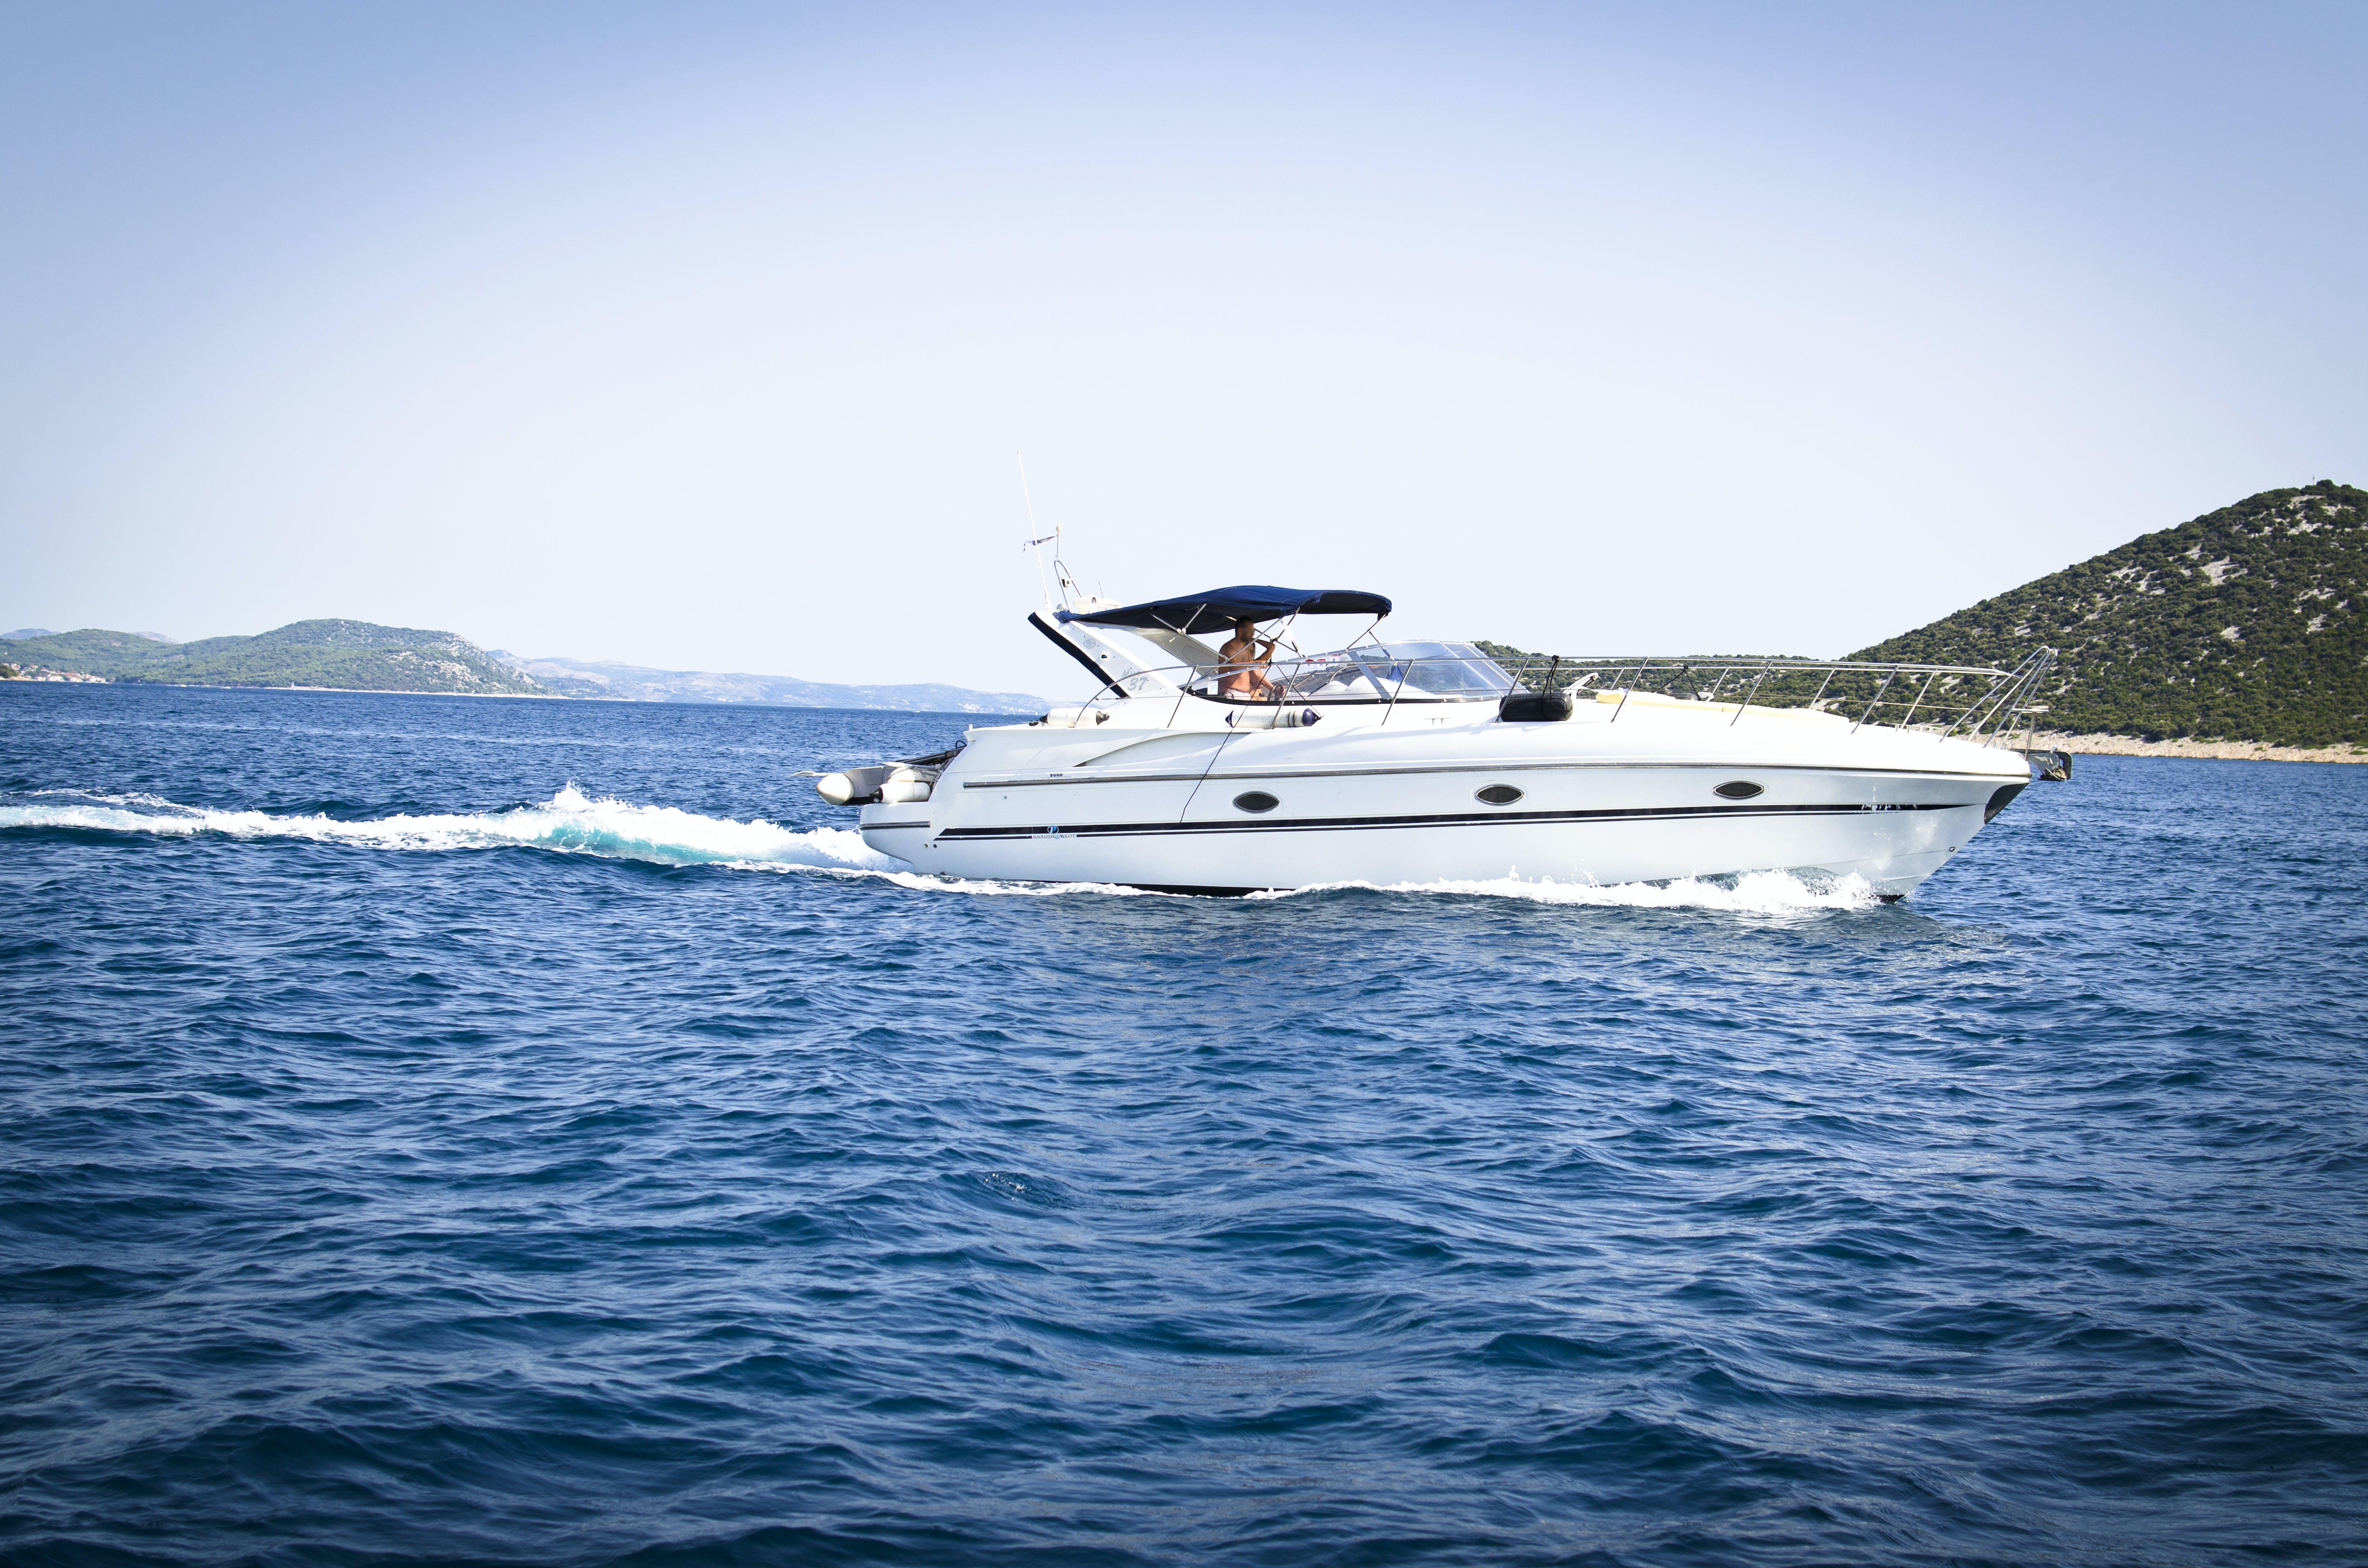 White Speedboat on Body of Water